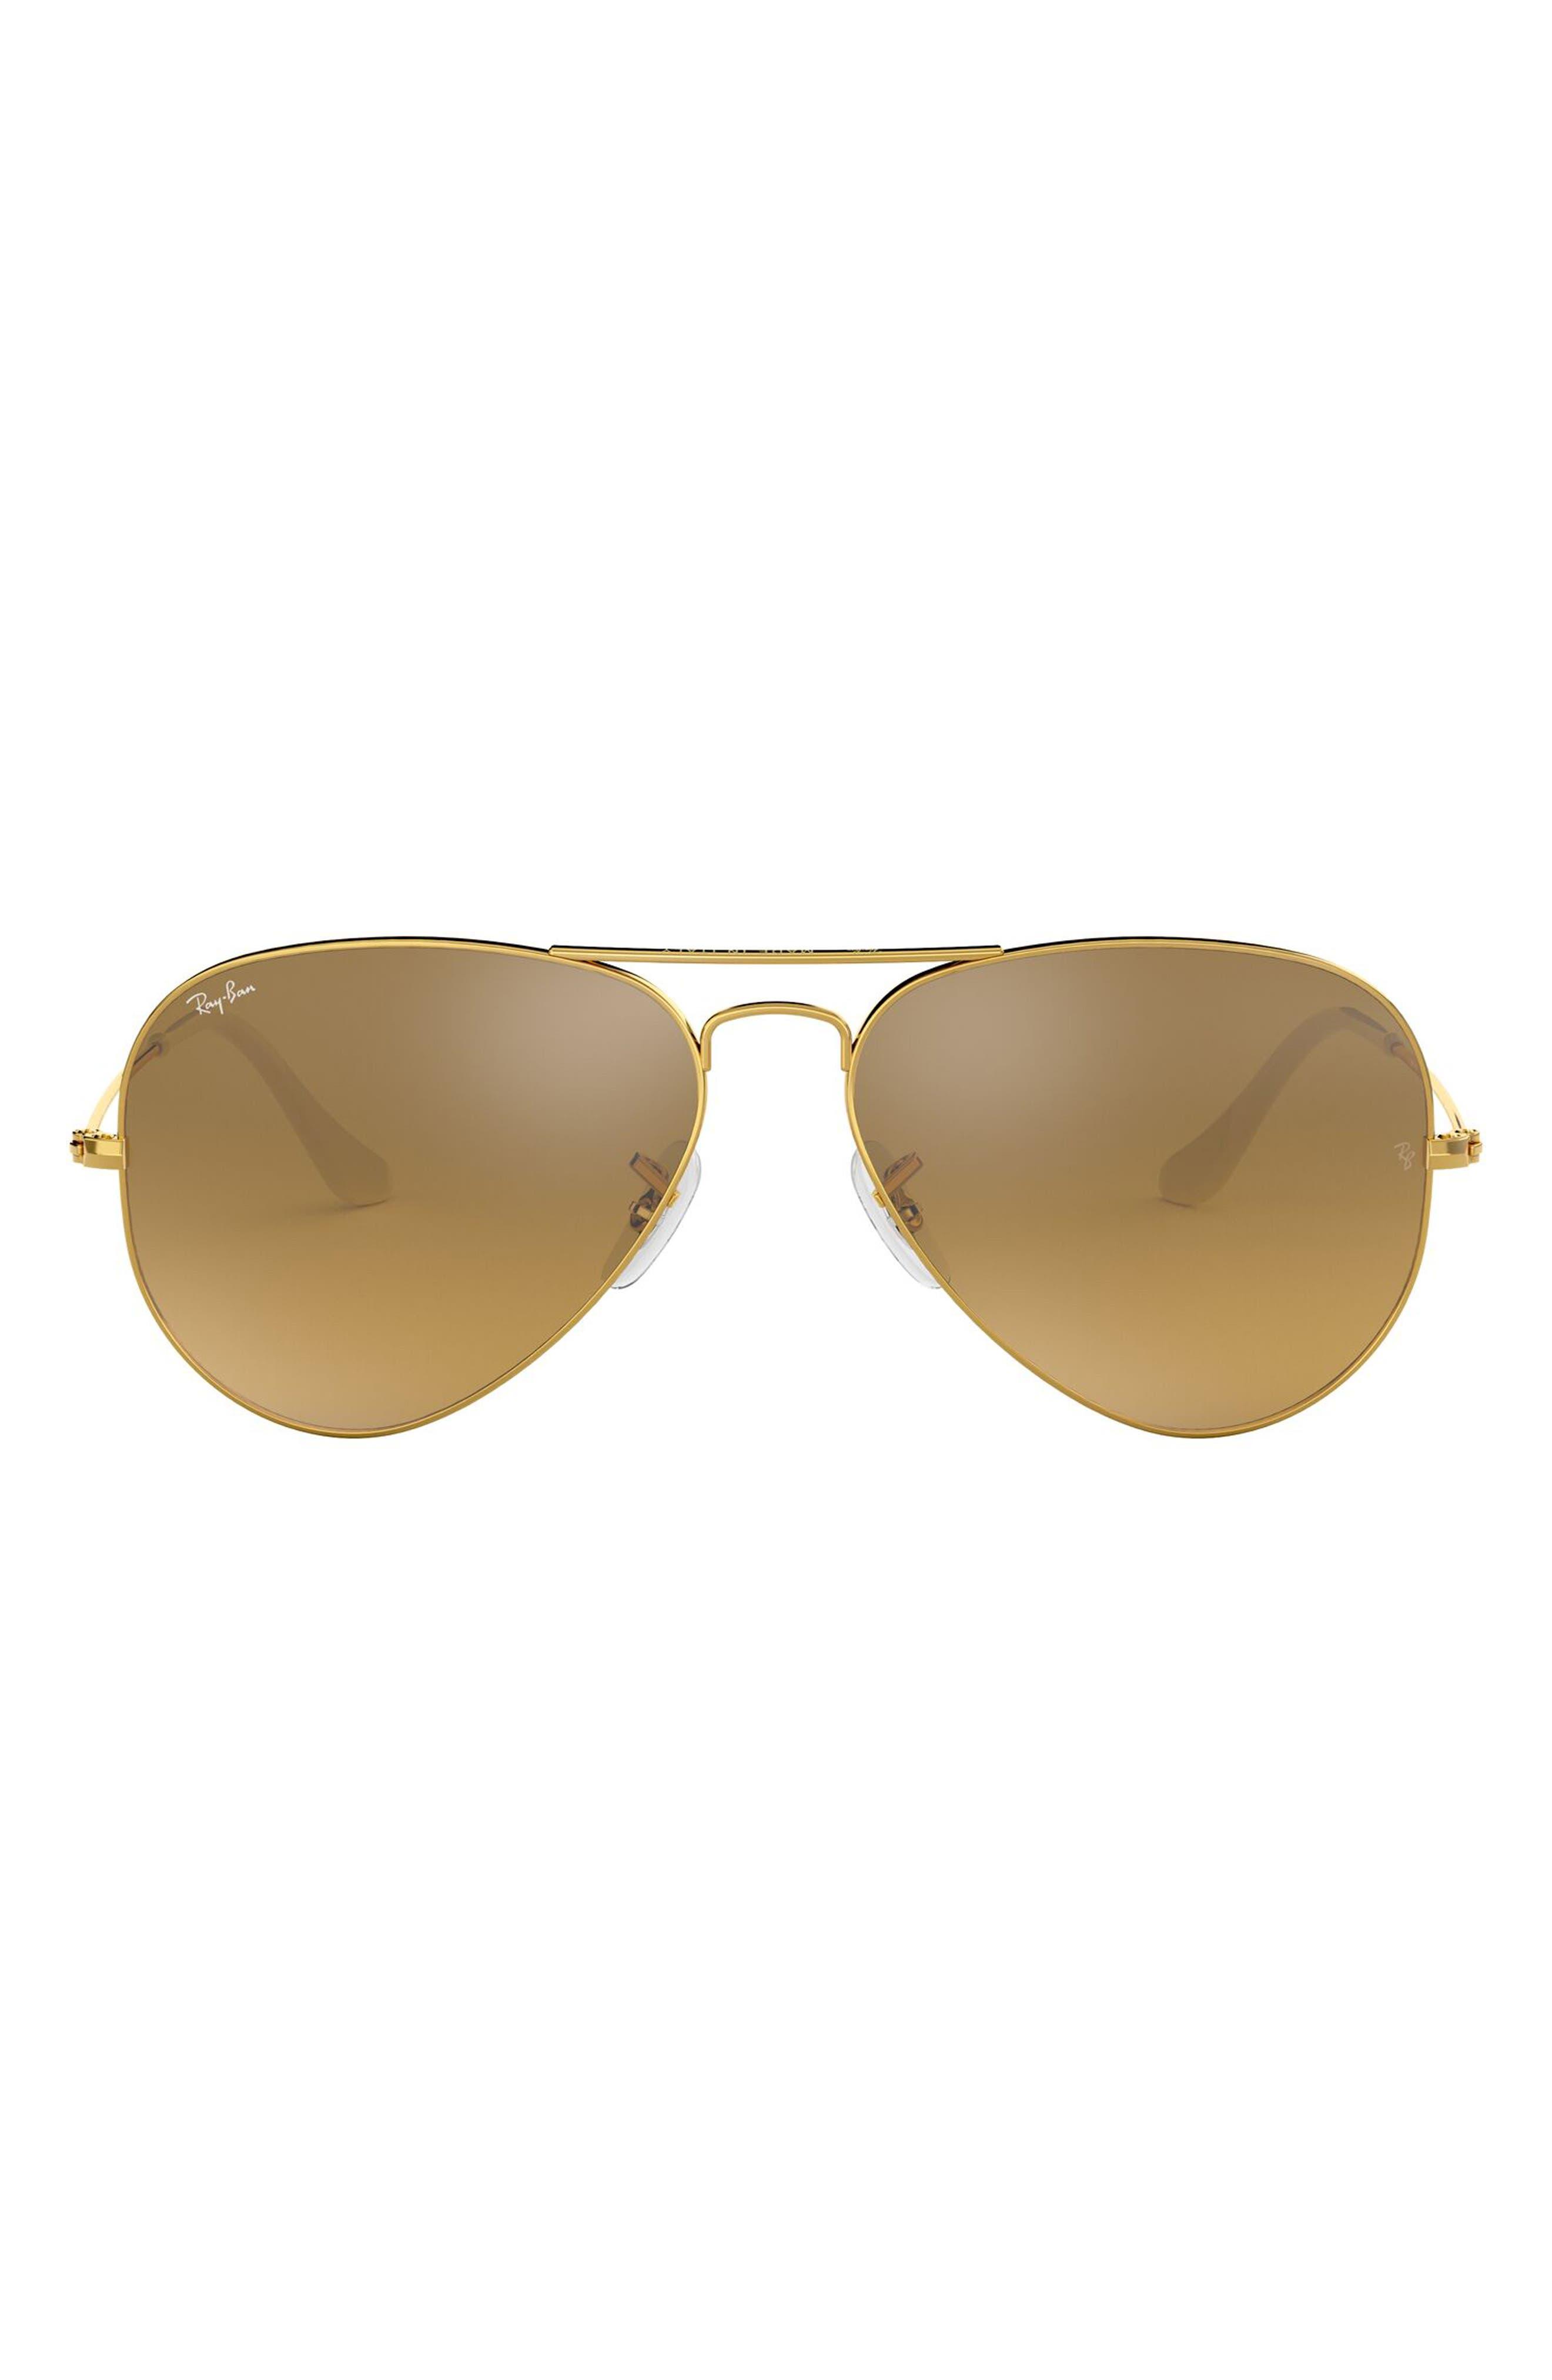 Ray-Ban Original 62mm Aviator Sunglasses - Blue Gradient